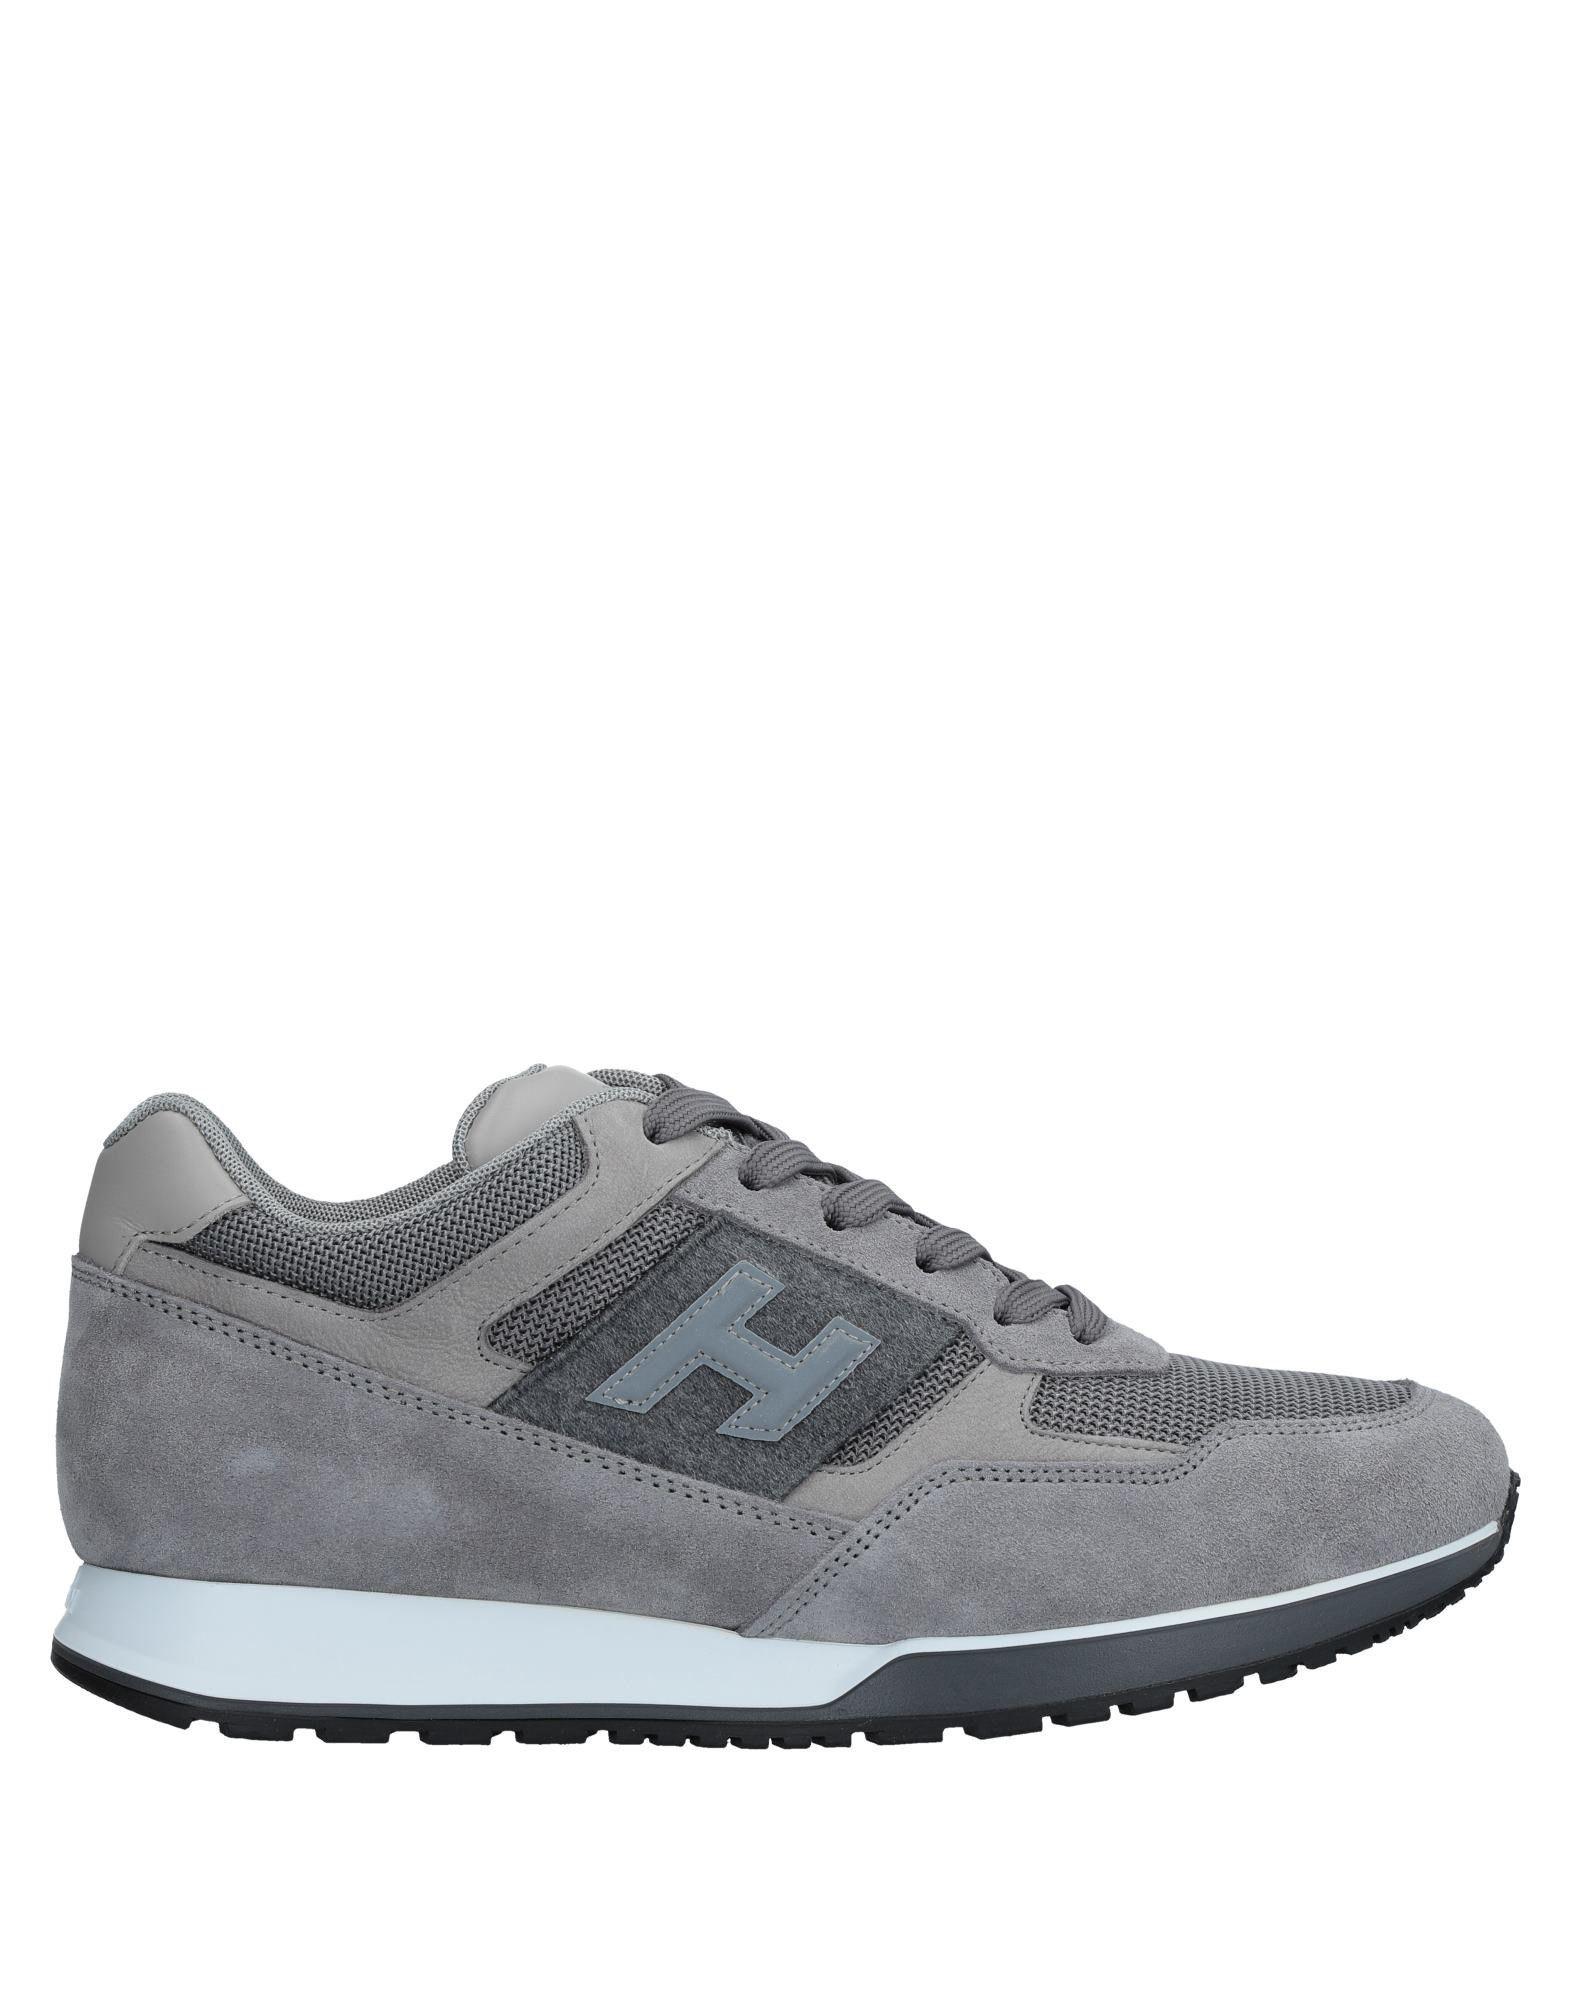 Moda Sneakers Hogan Uomo 11540987IT - 11540987IT Uomo ebc668